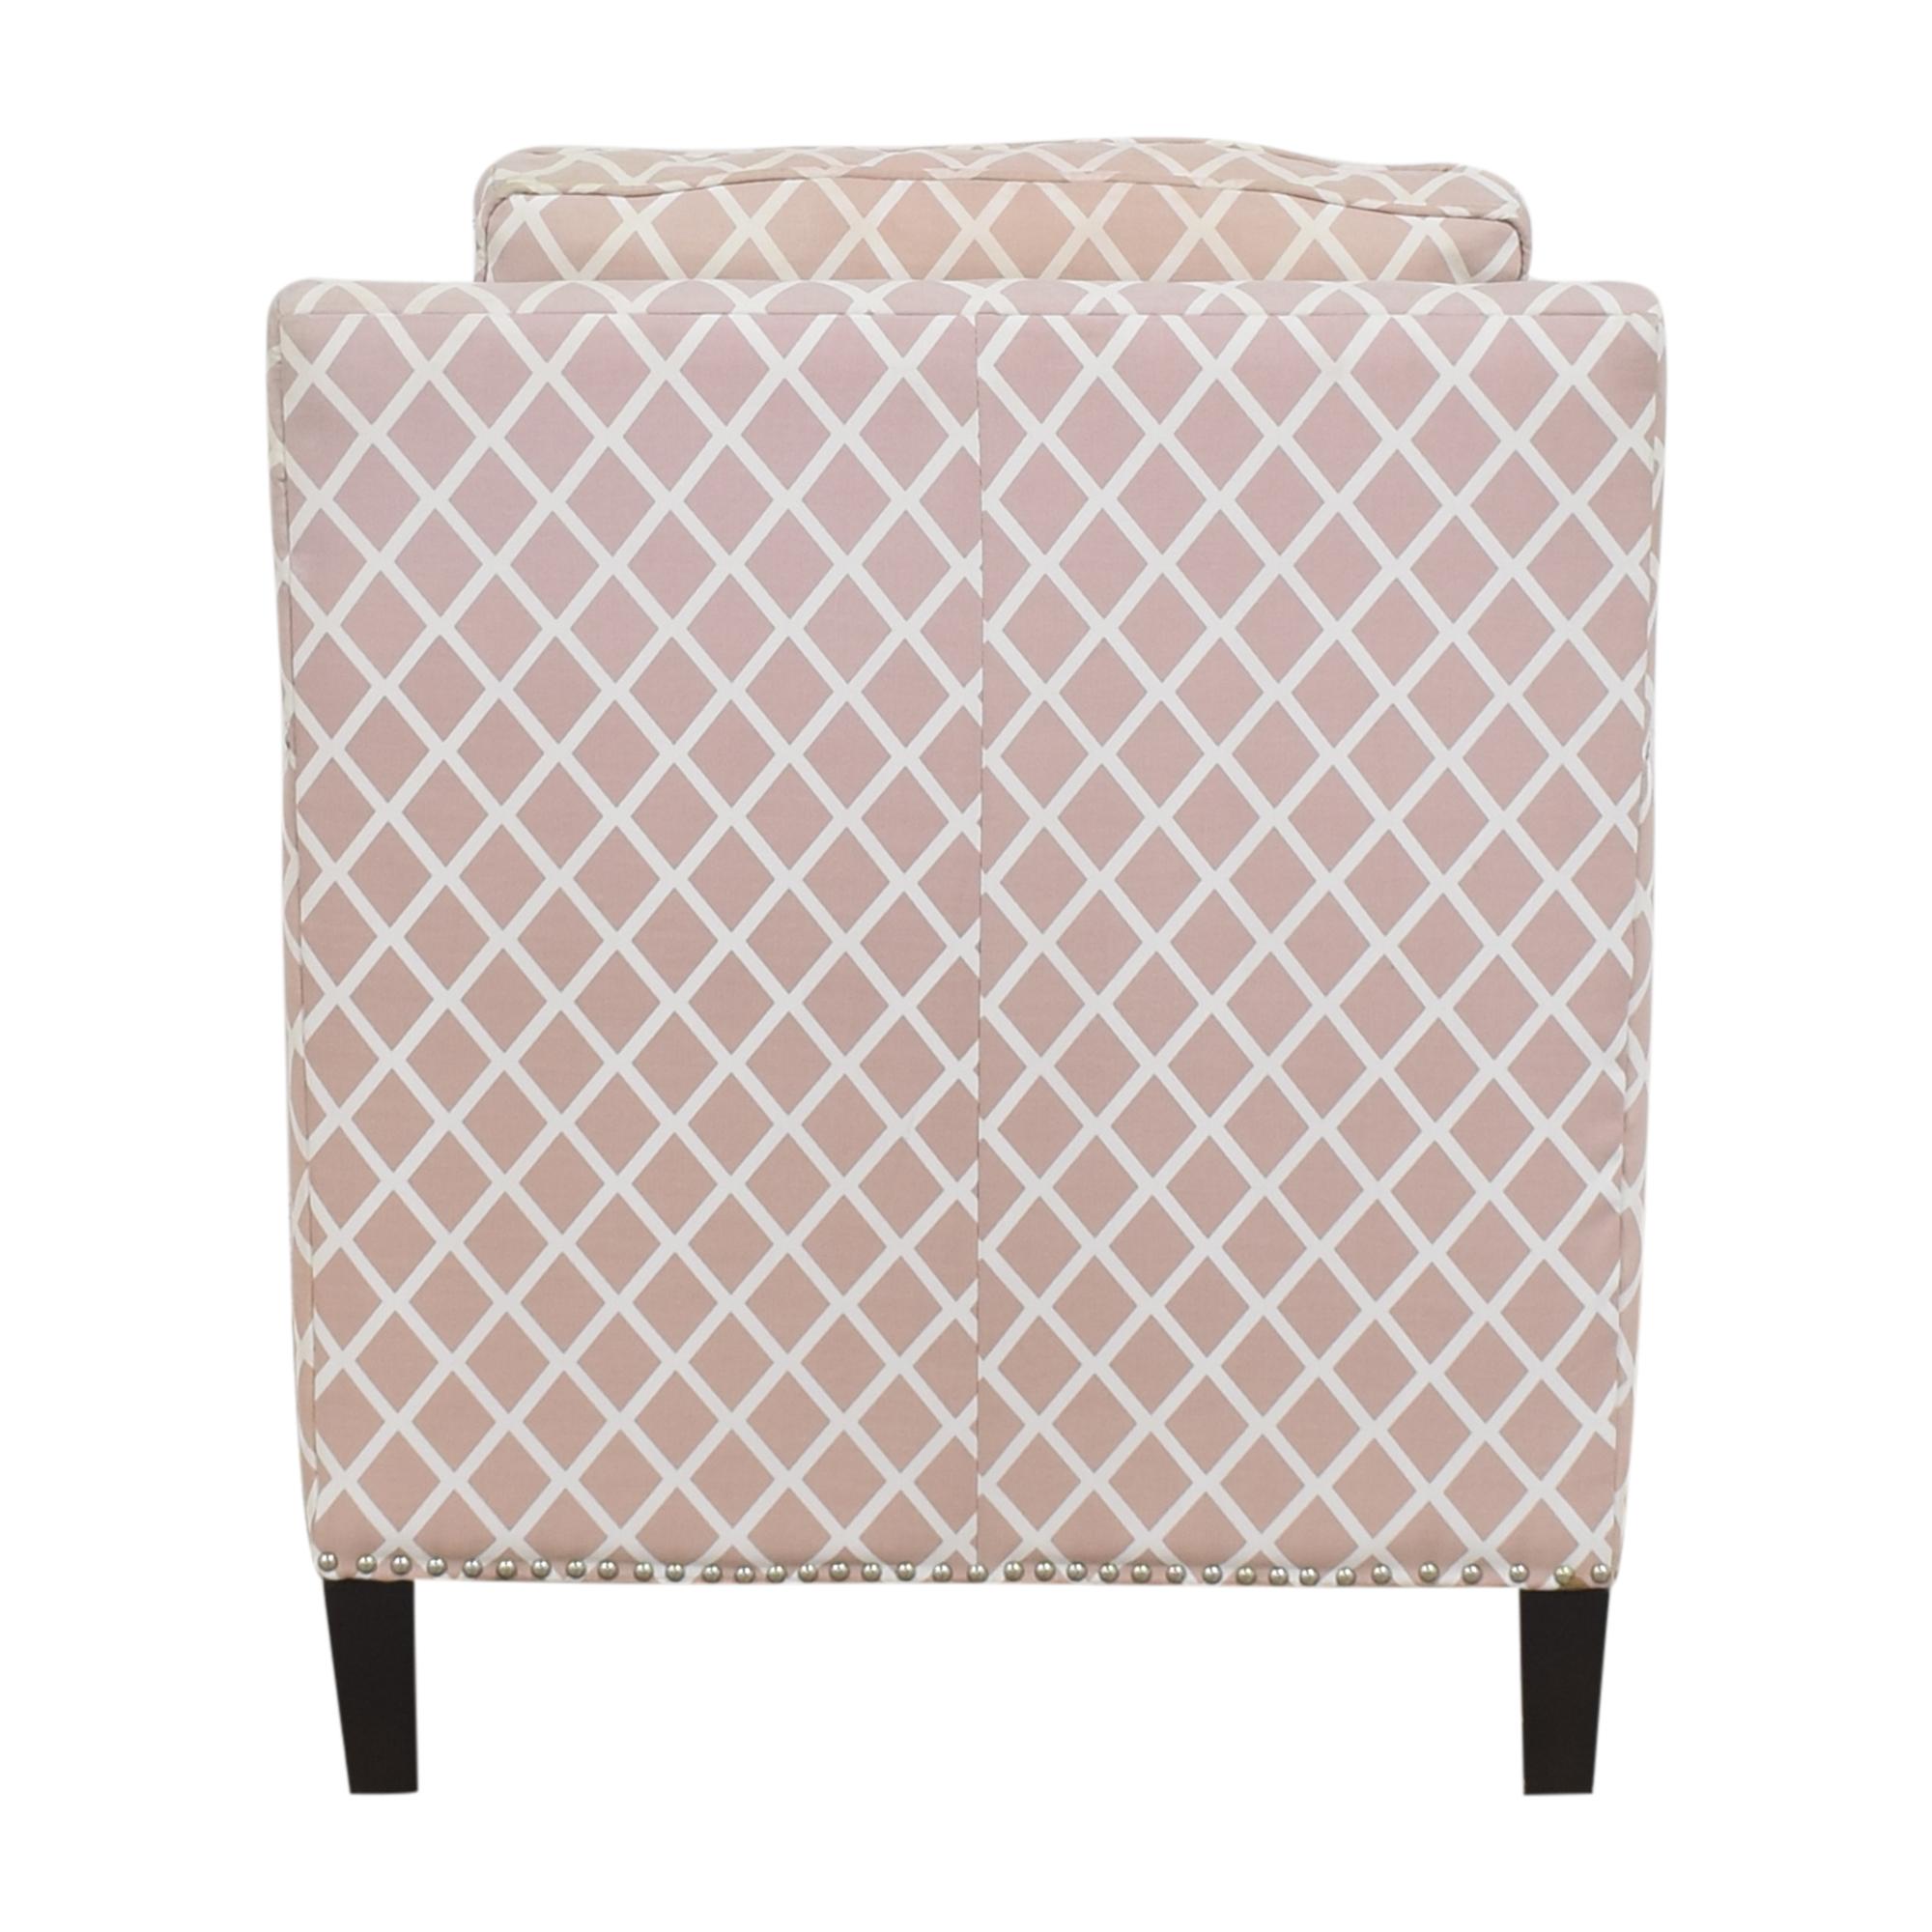 Safavieh Buckler Accent Chair / Chairs